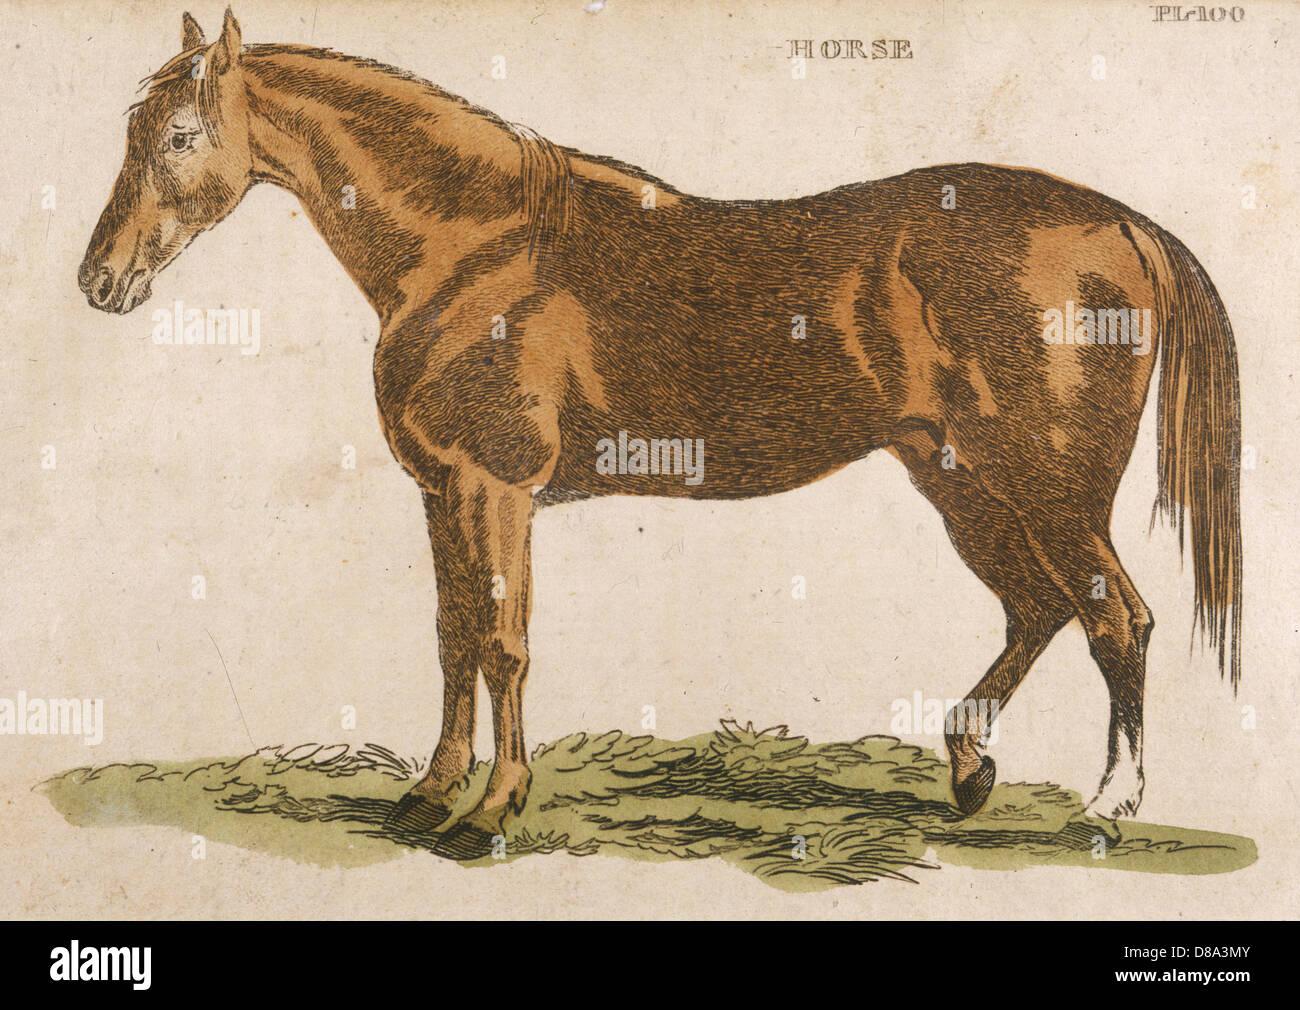 Horse Brightly 1811 - Stock Image